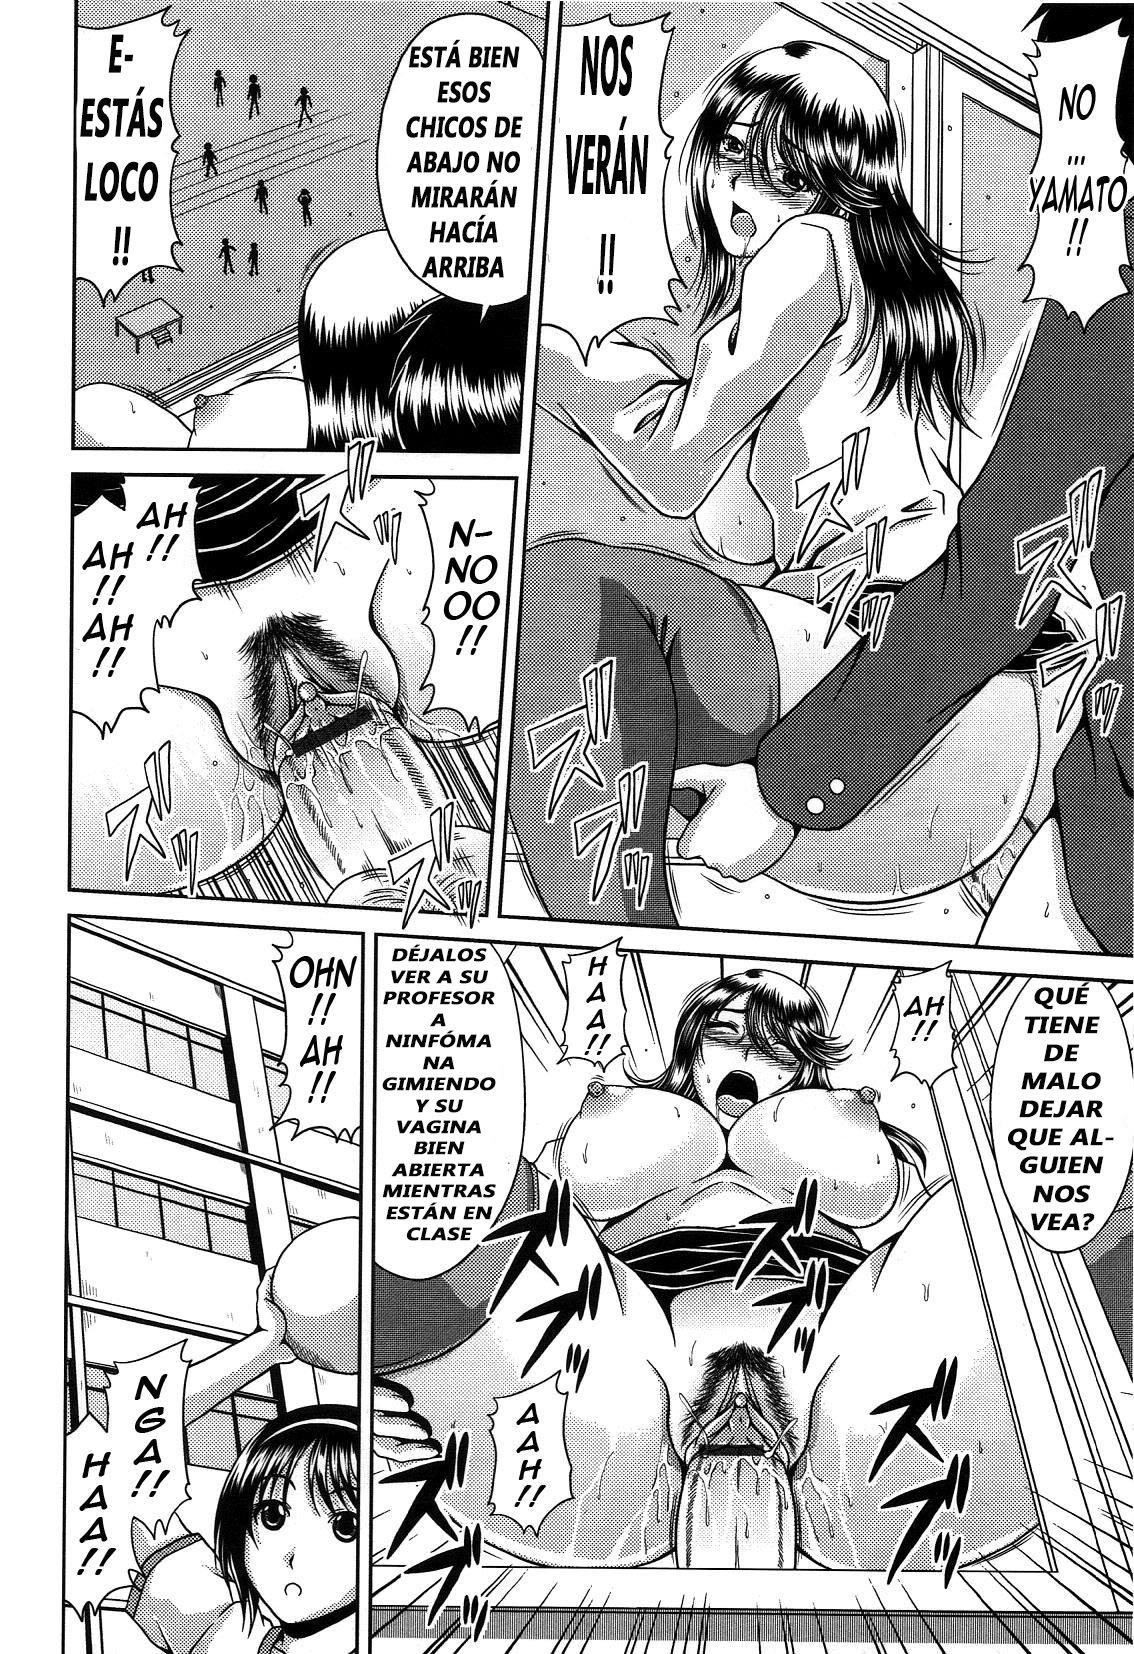 Camron diaz gets naked